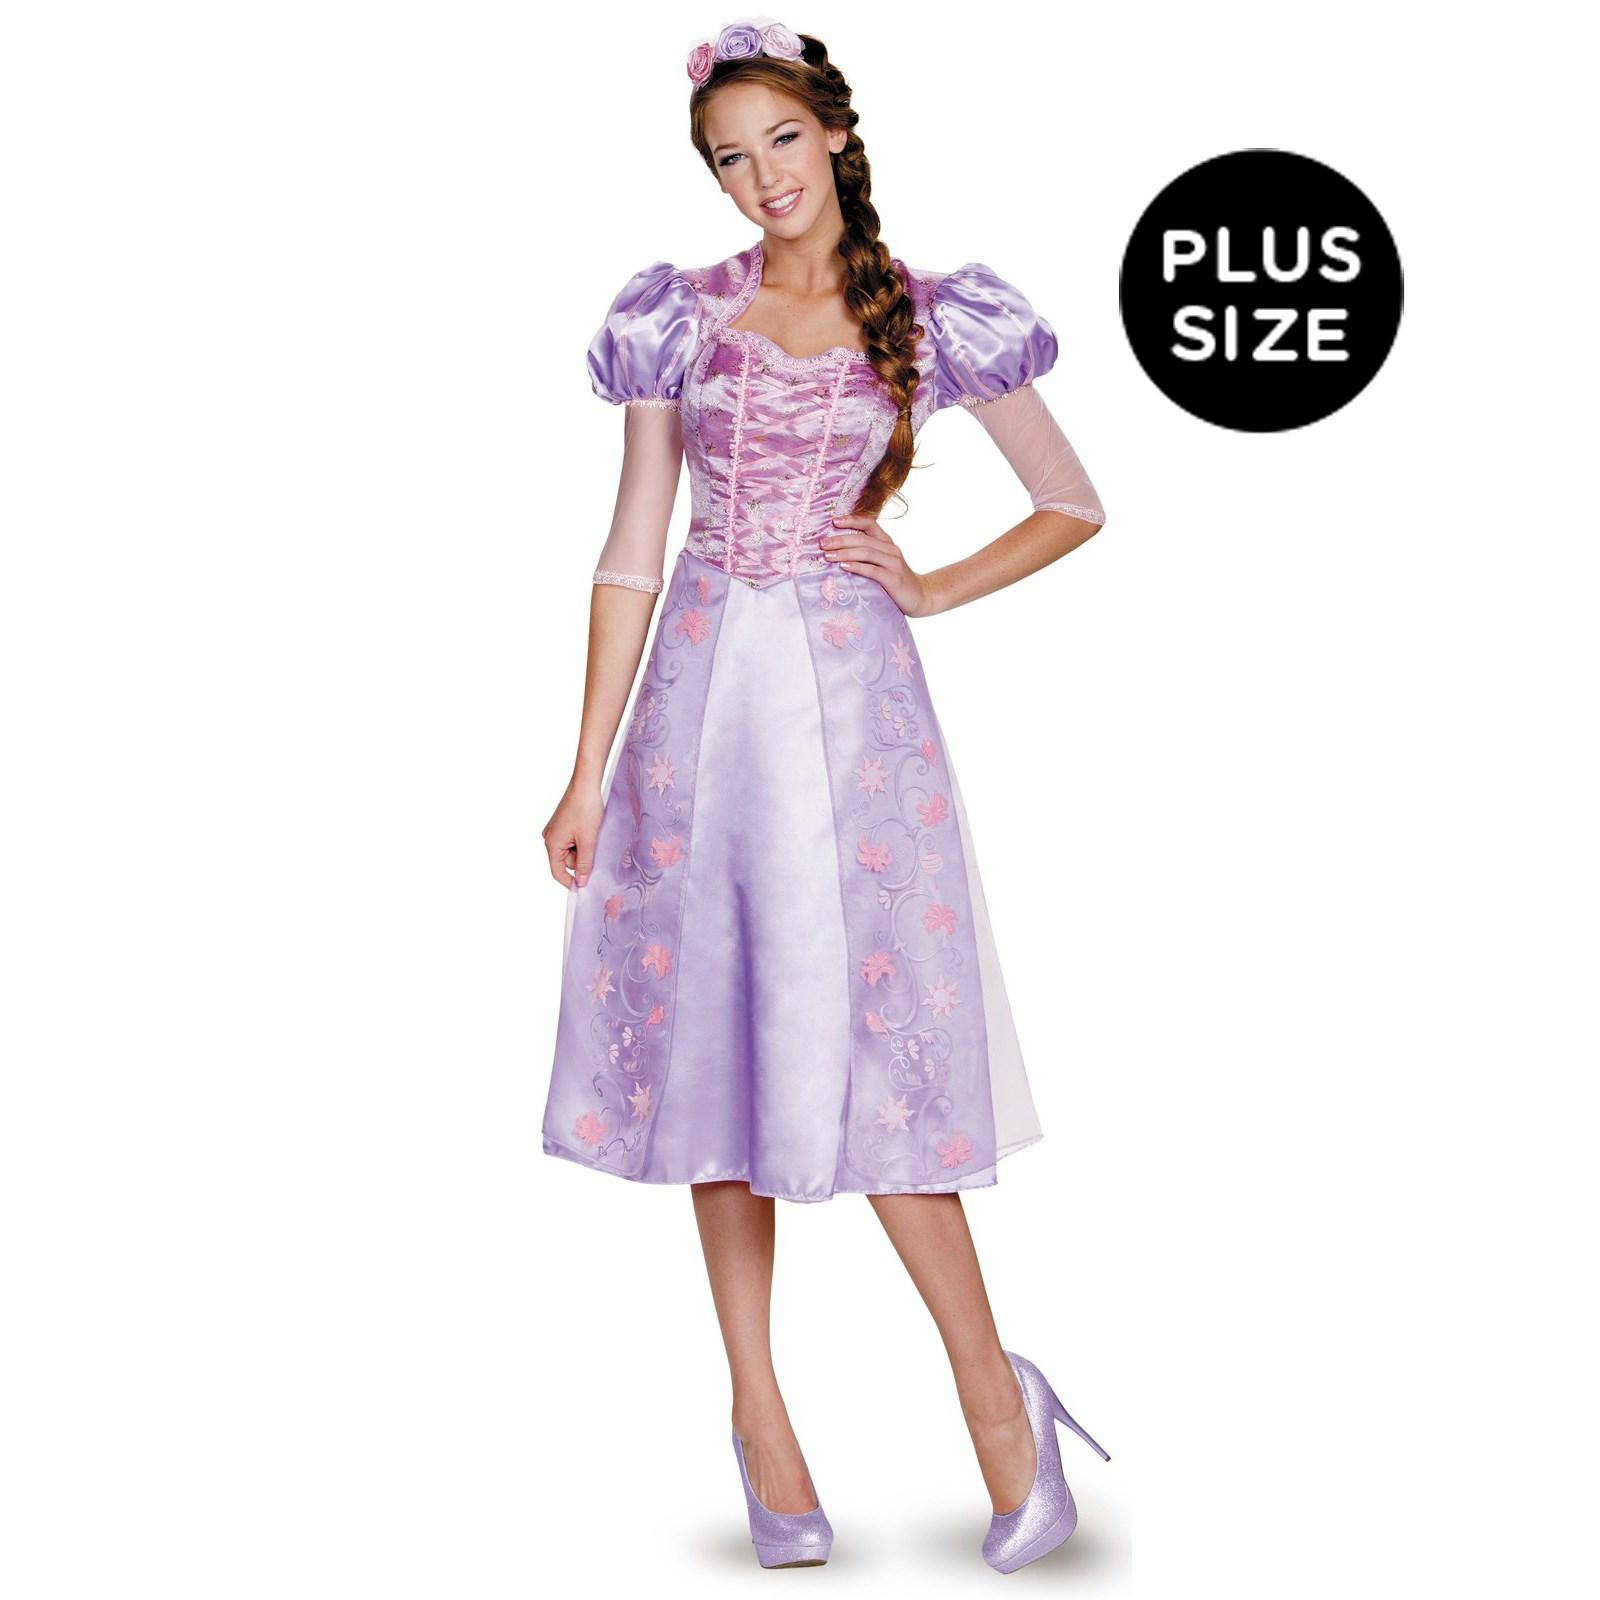 Disney Princess Deluxe Plus Size Rapunzel Costume For Women